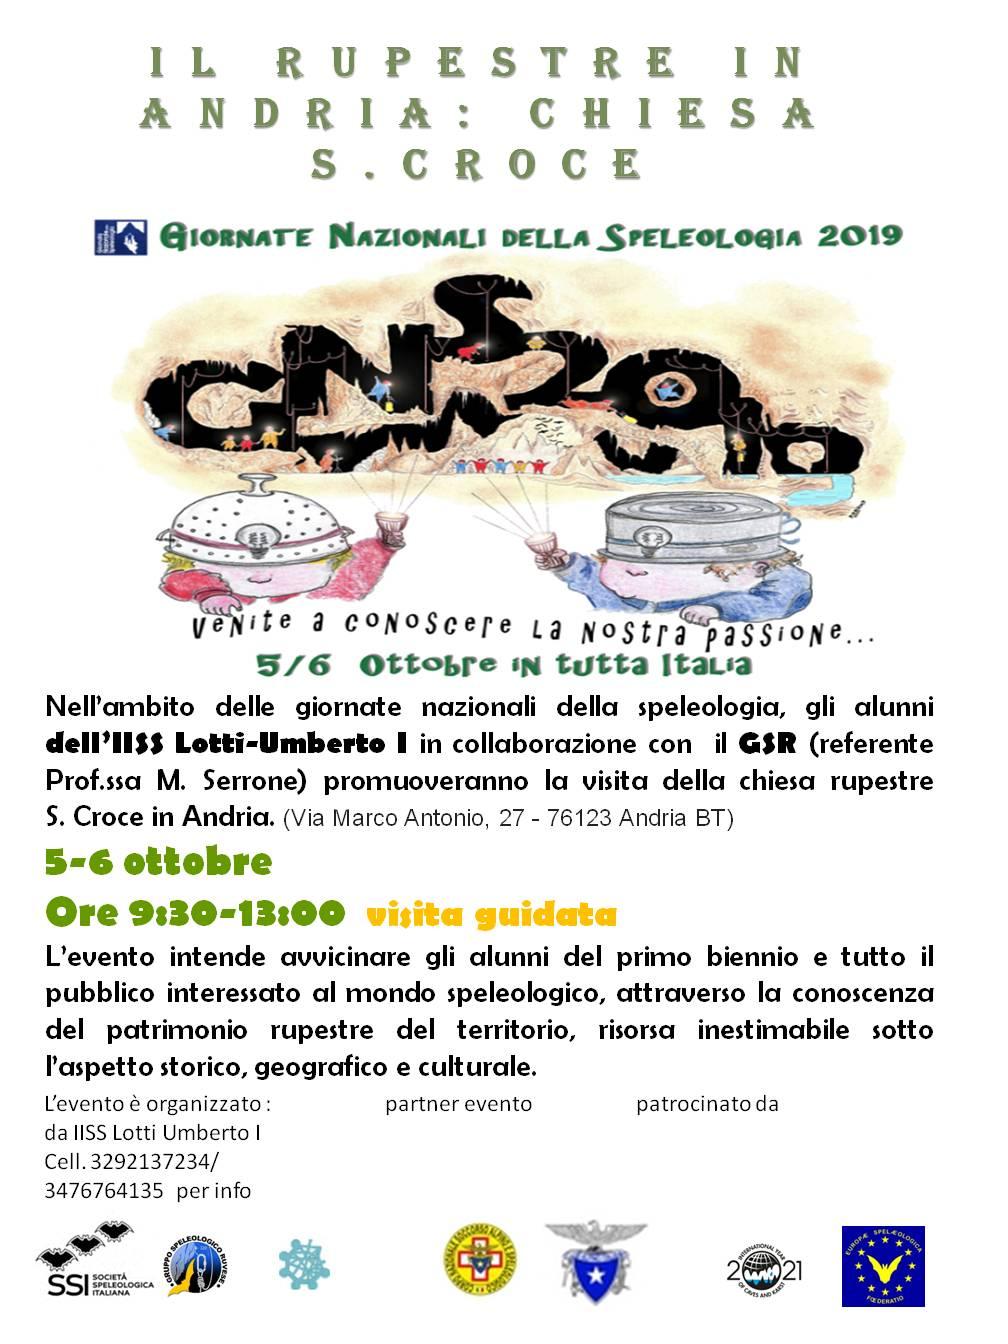 LOCANDINA Visita guidata Chiesa Santa Croce Andria 2019 - Gruppo Speleologico Ruvese